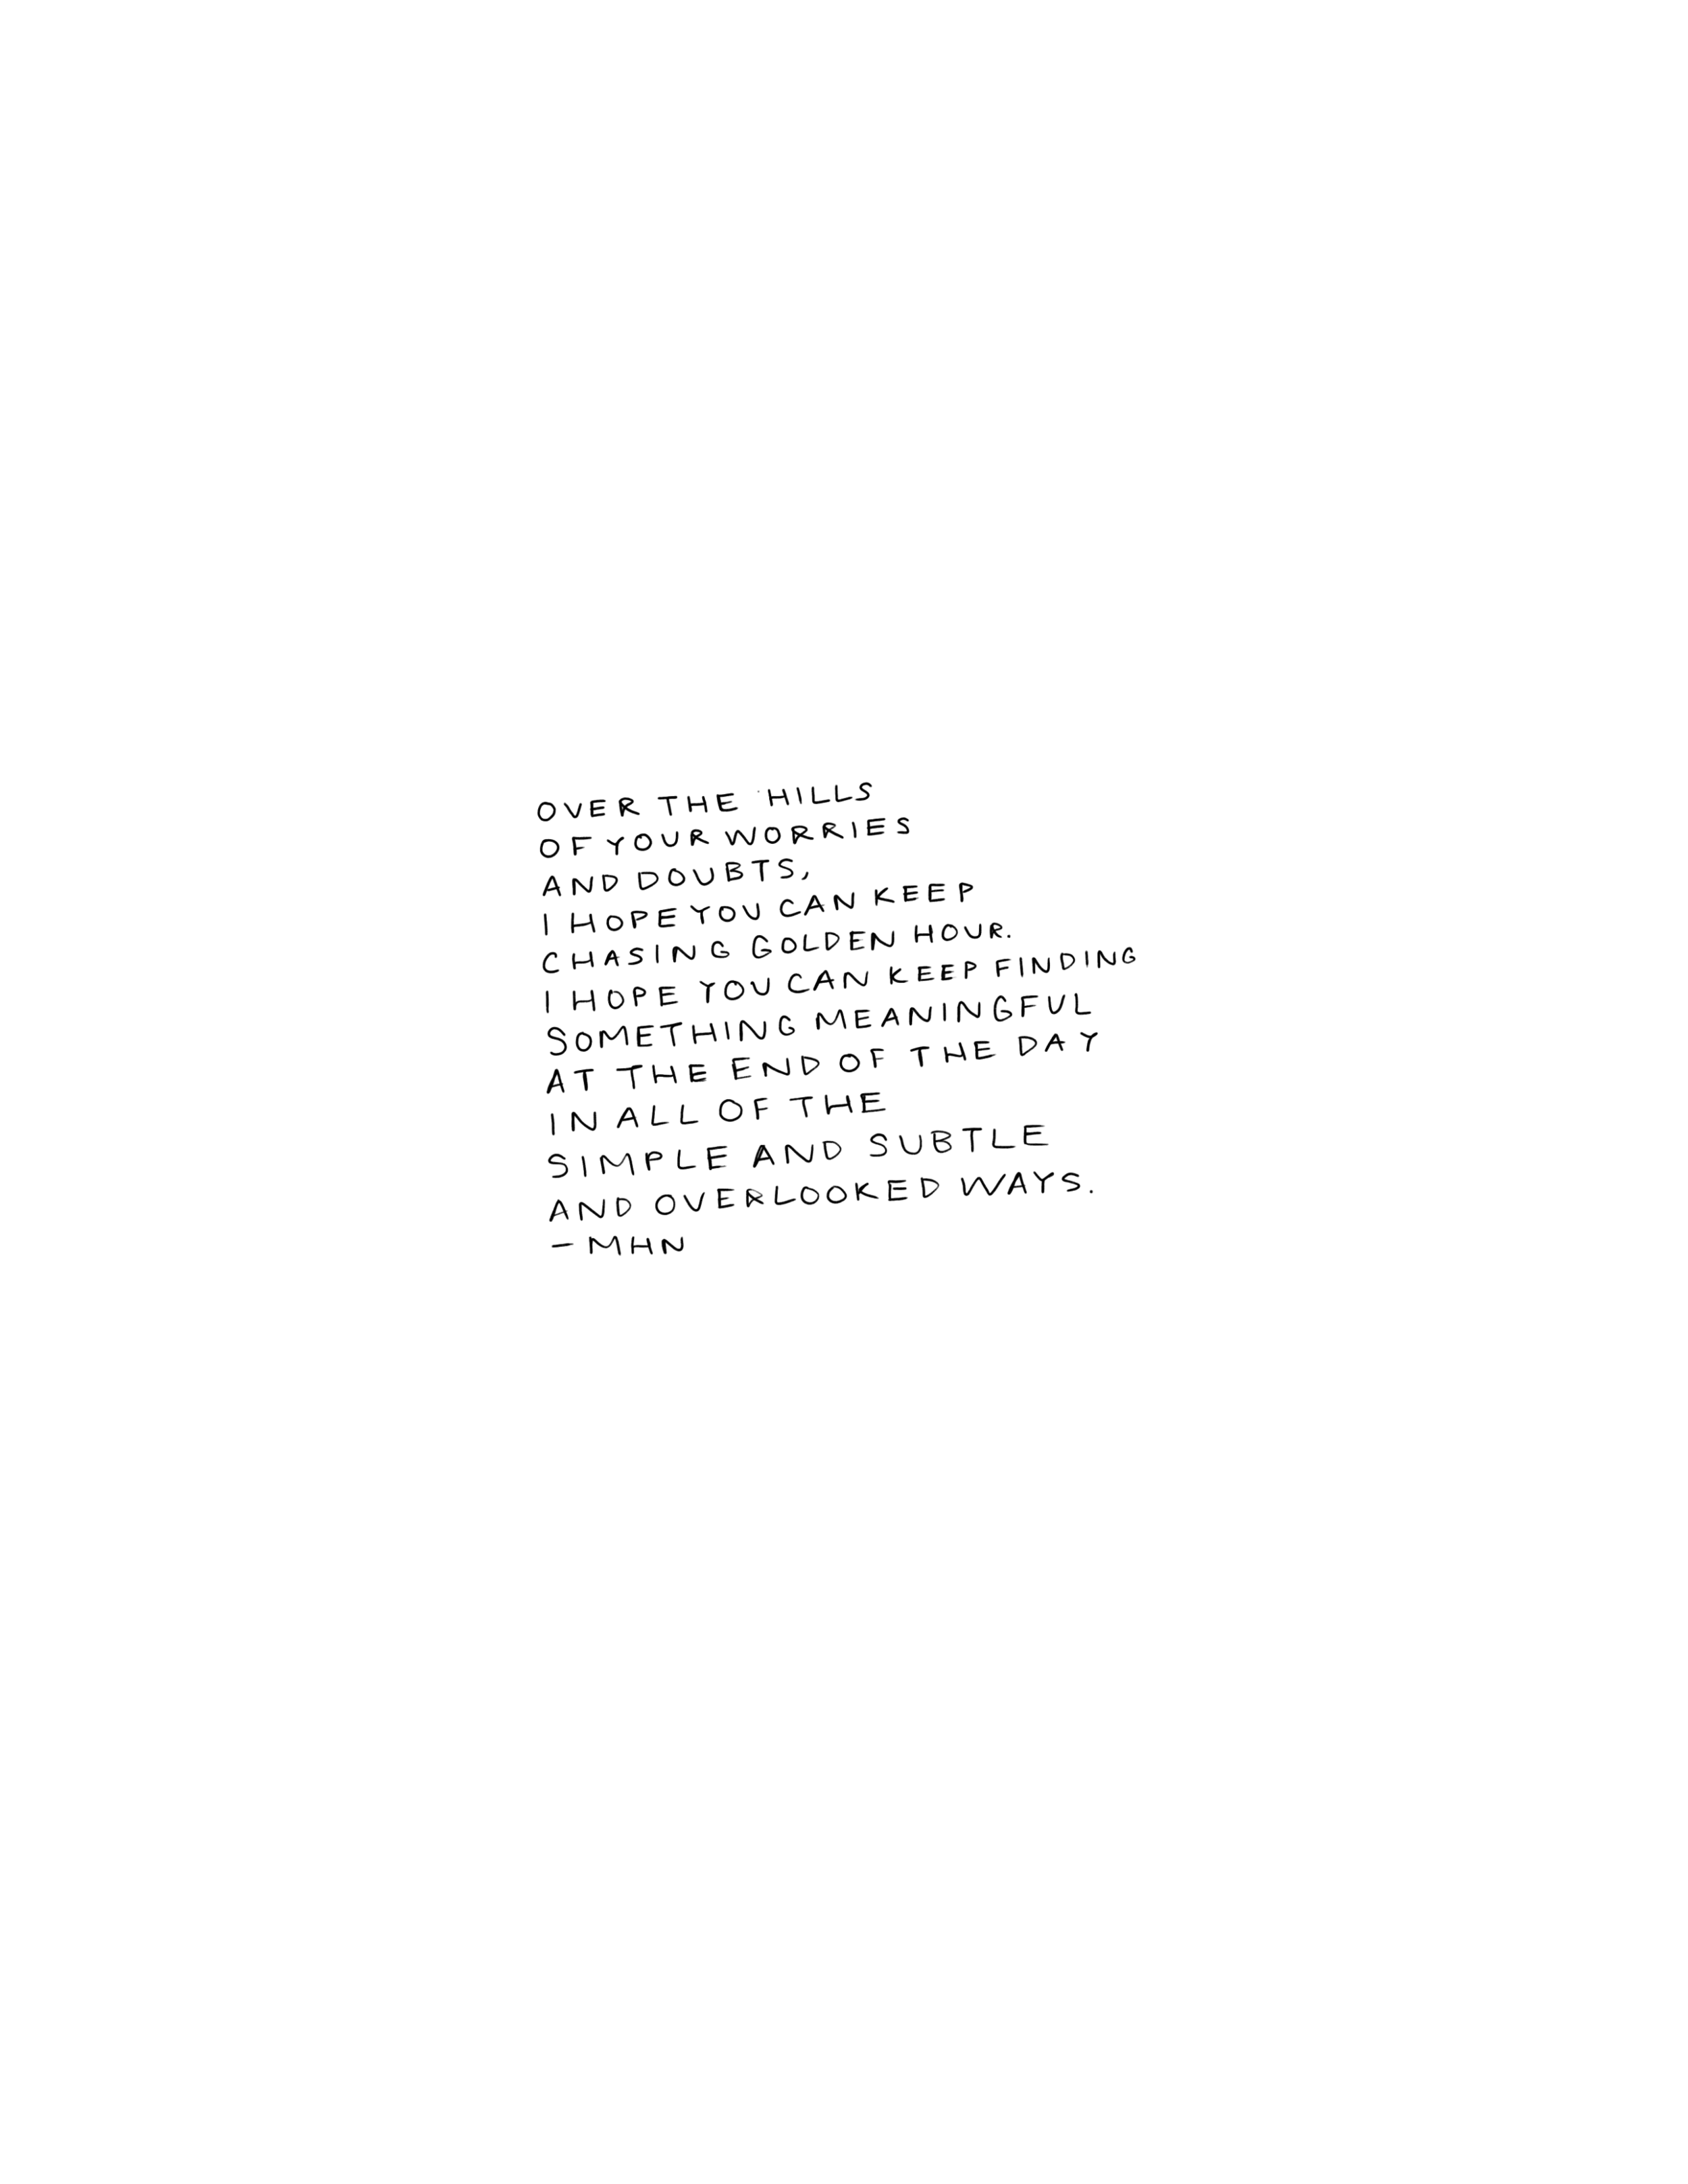 File_001 (59).png